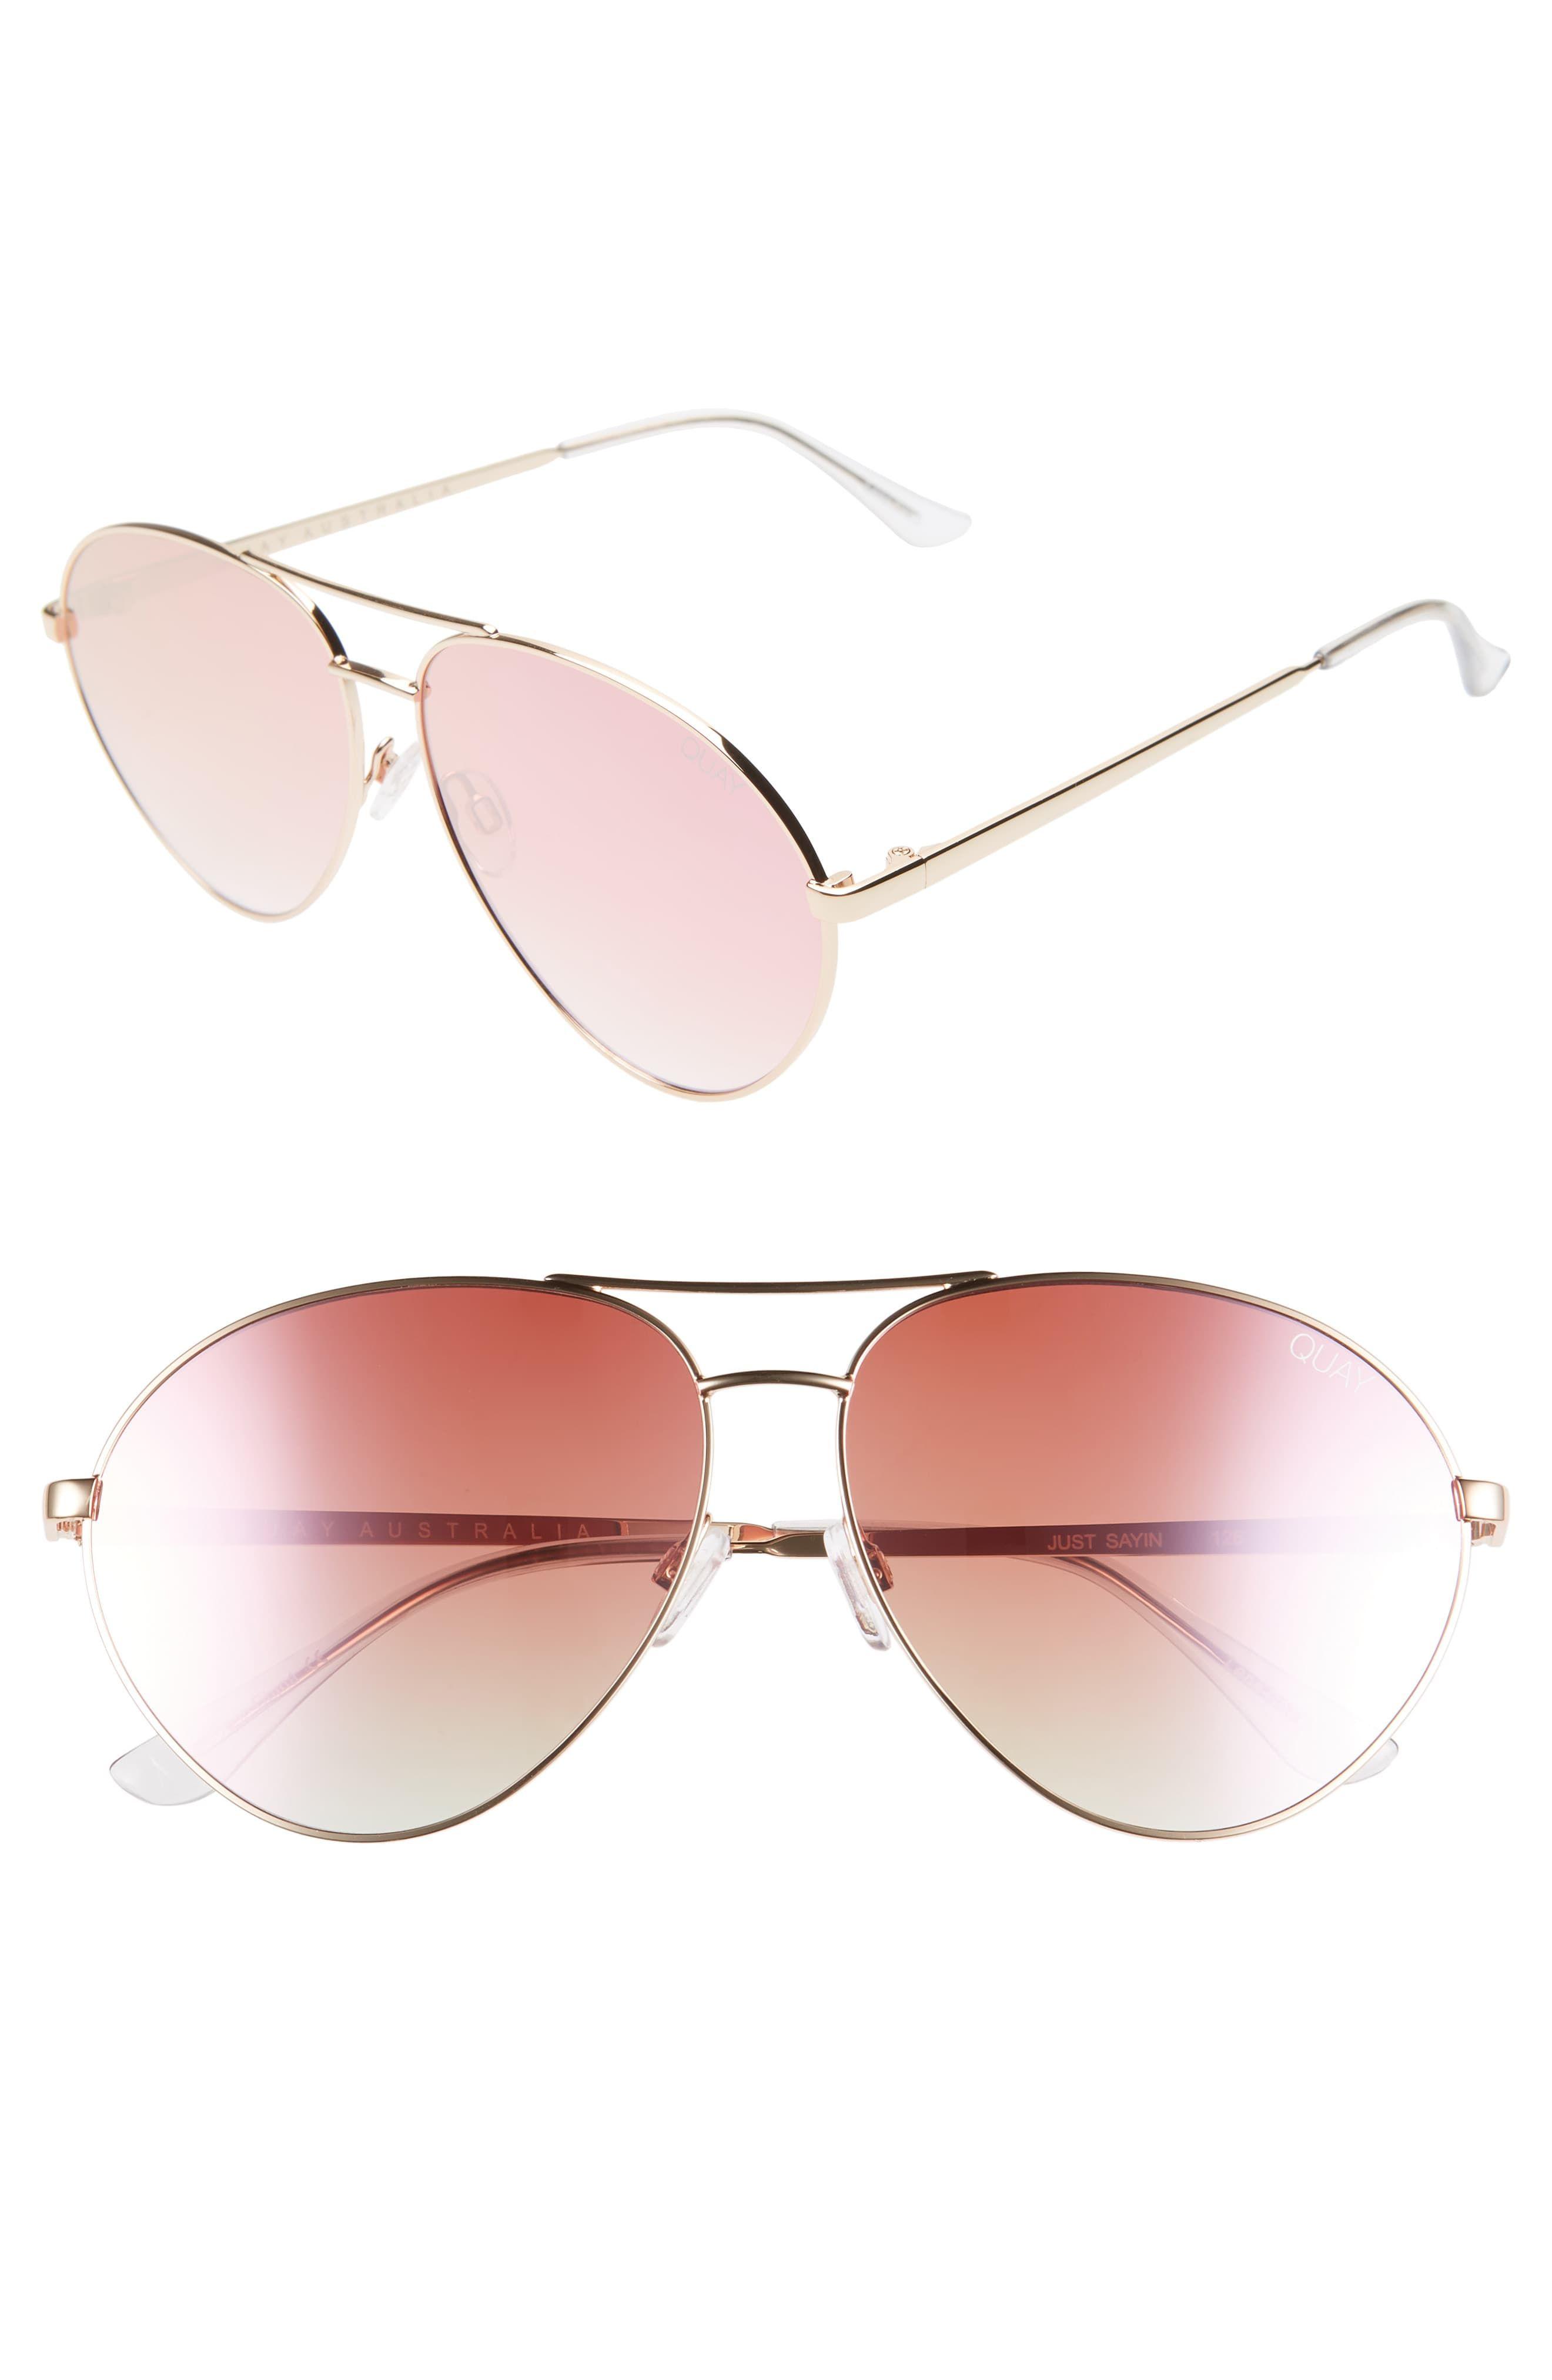 Quay Australia Just Sayin 59mm Aviator Sunglasses